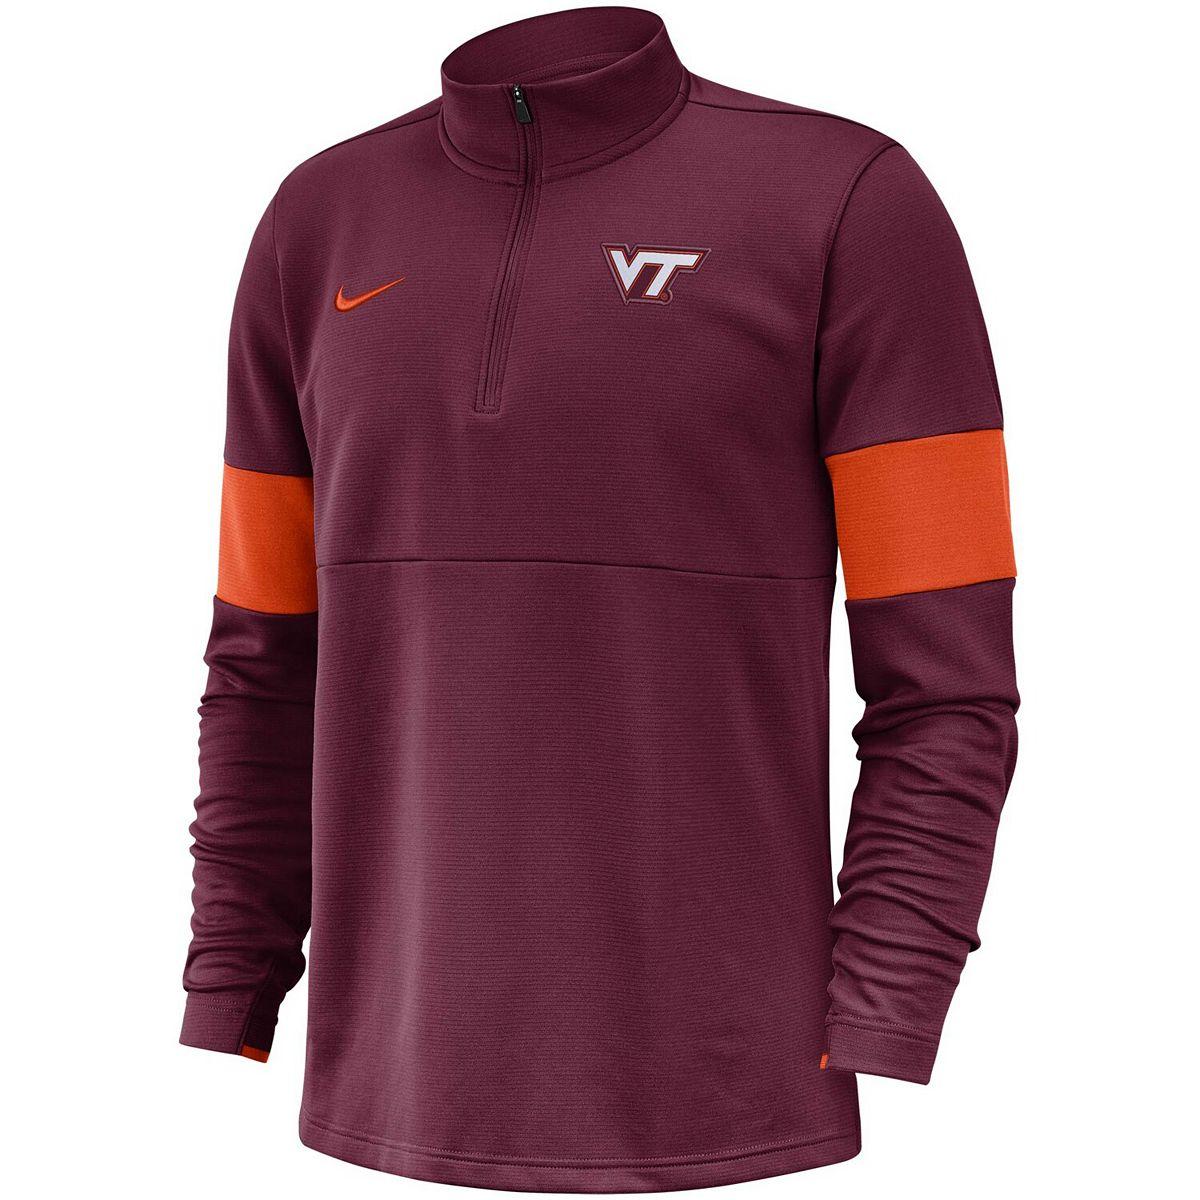 Men's Nike Maroon Virginia Tech Hokies 2019 Coaches Sideline Performance Half-Zip Pullover Jacket f5wz0